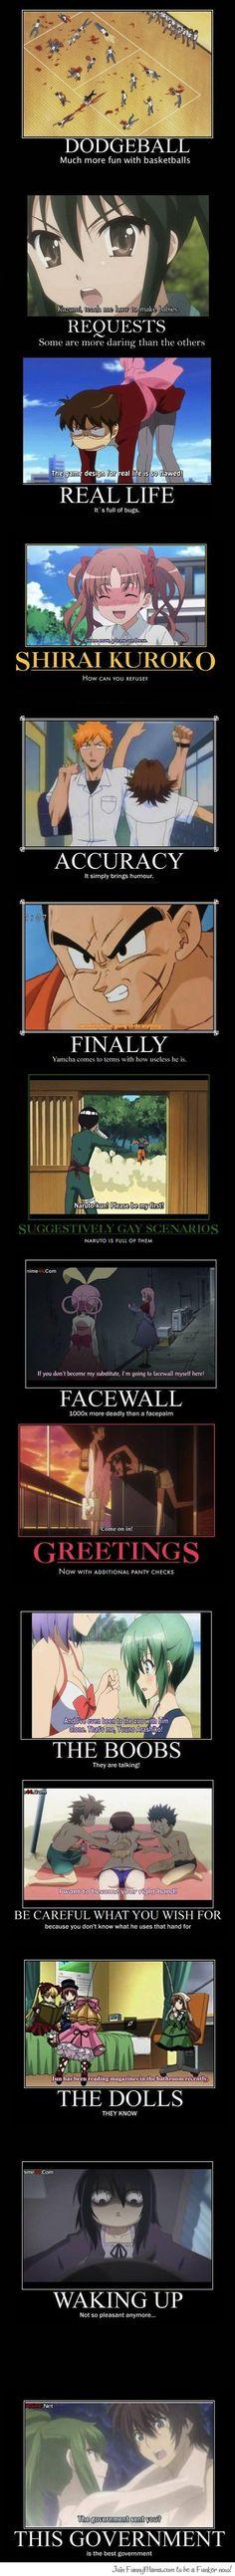 Anime Mot Posters